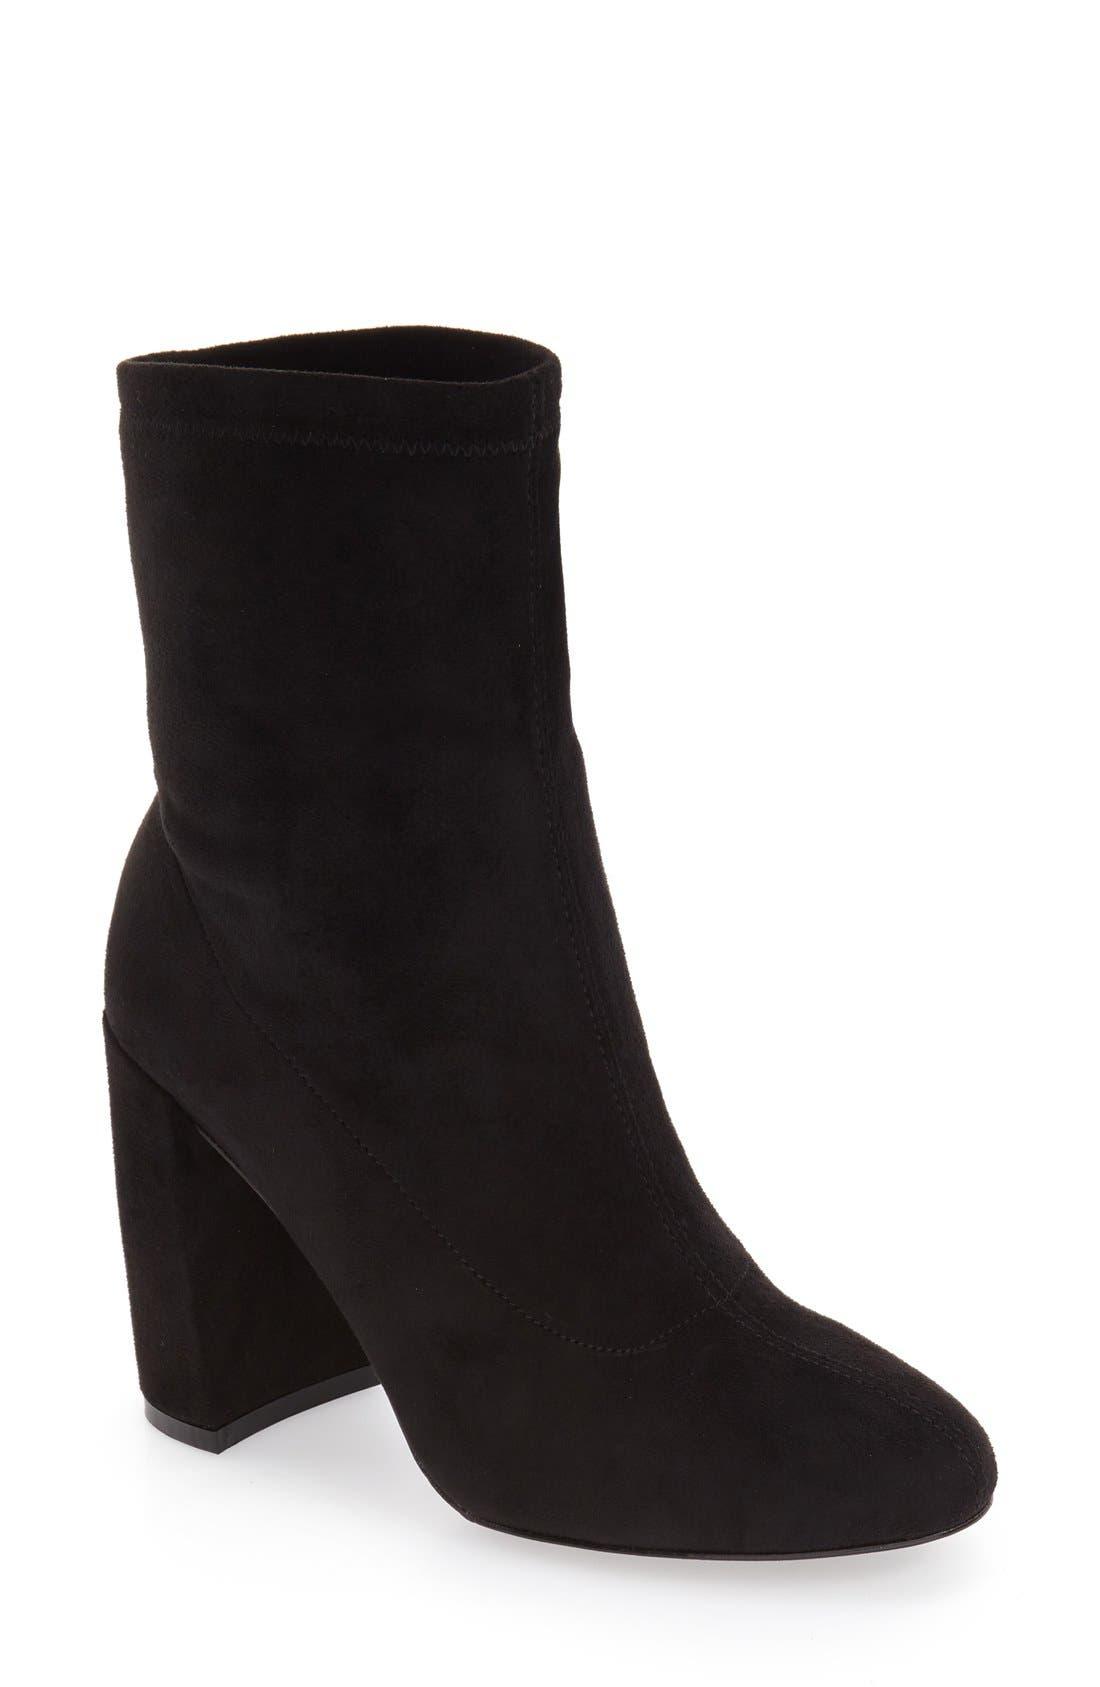 'Lilianna' Block Heel Bootie, Main, color, 002